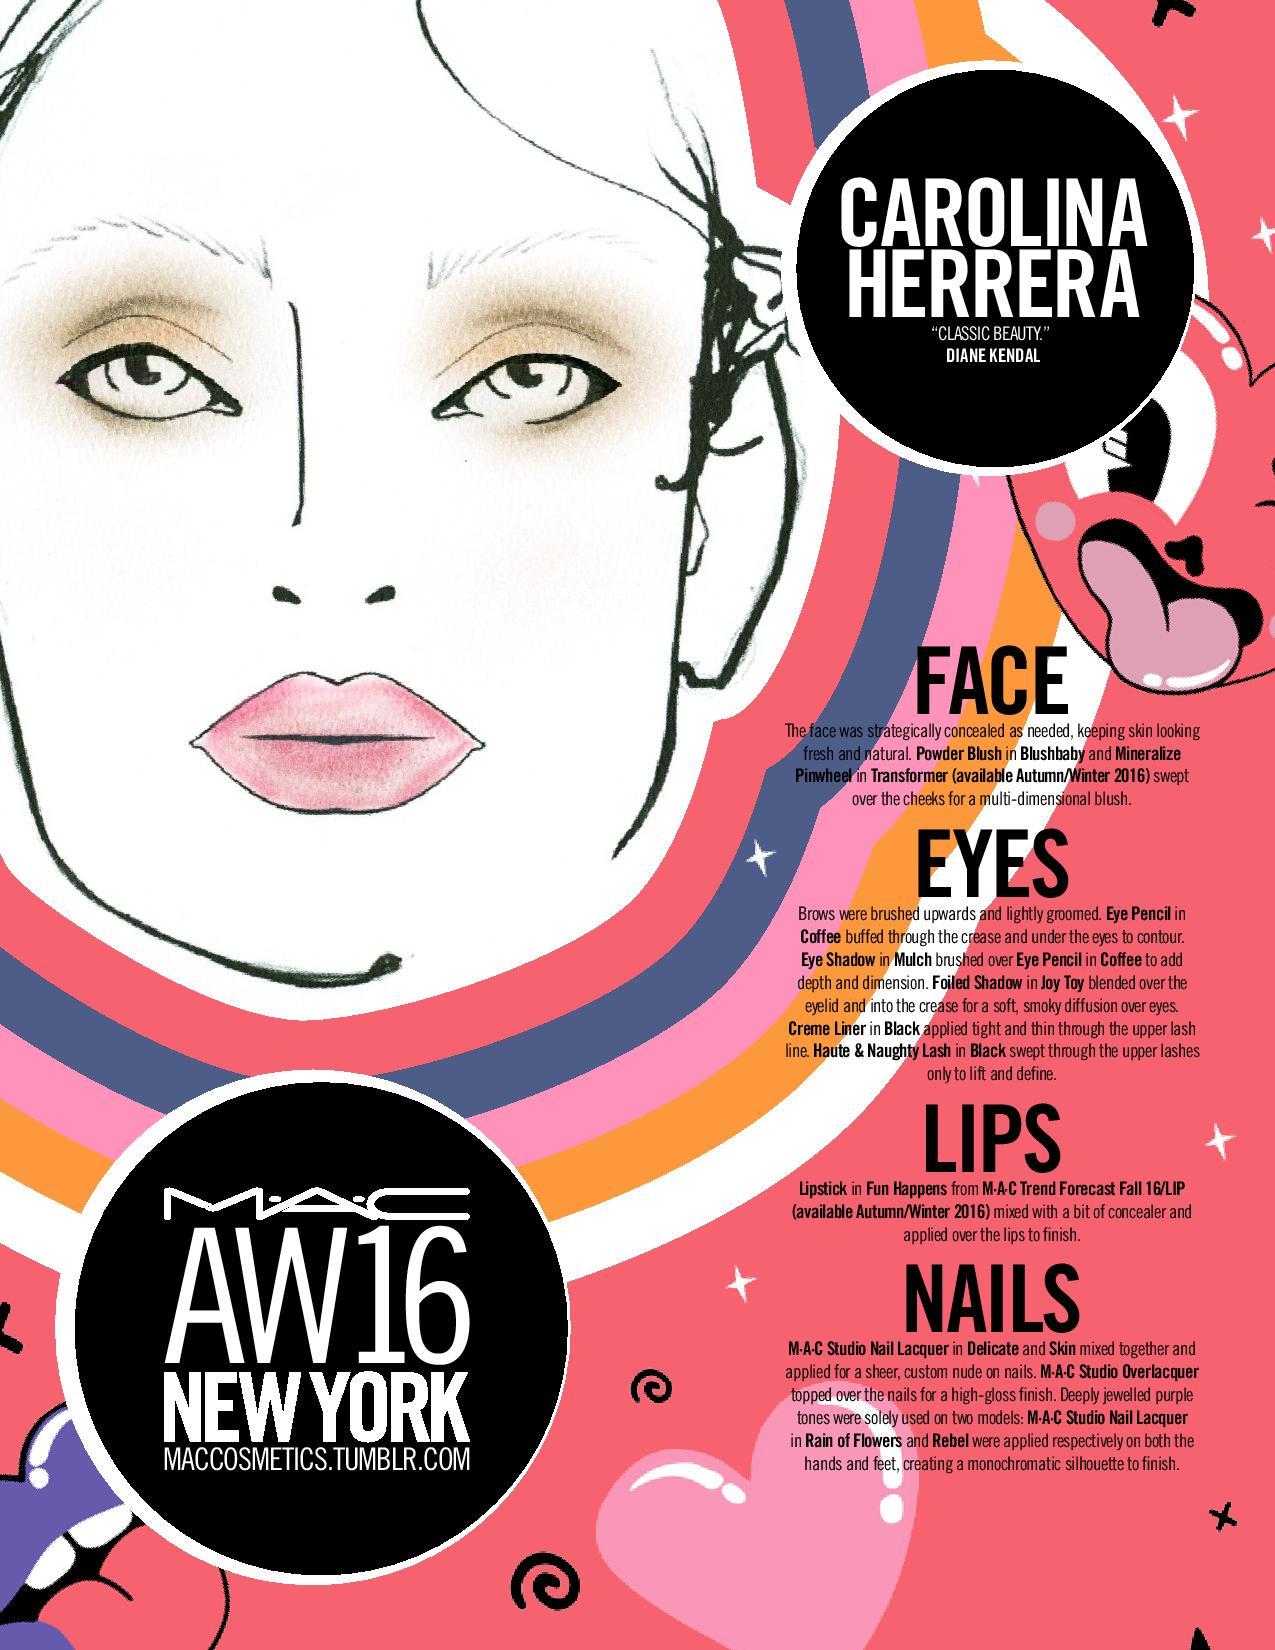 AW16_DAILY FACECHART_NEW YORK_FEB 15 Carolina Herrera, Jeremy Scott, Rag...-page-002